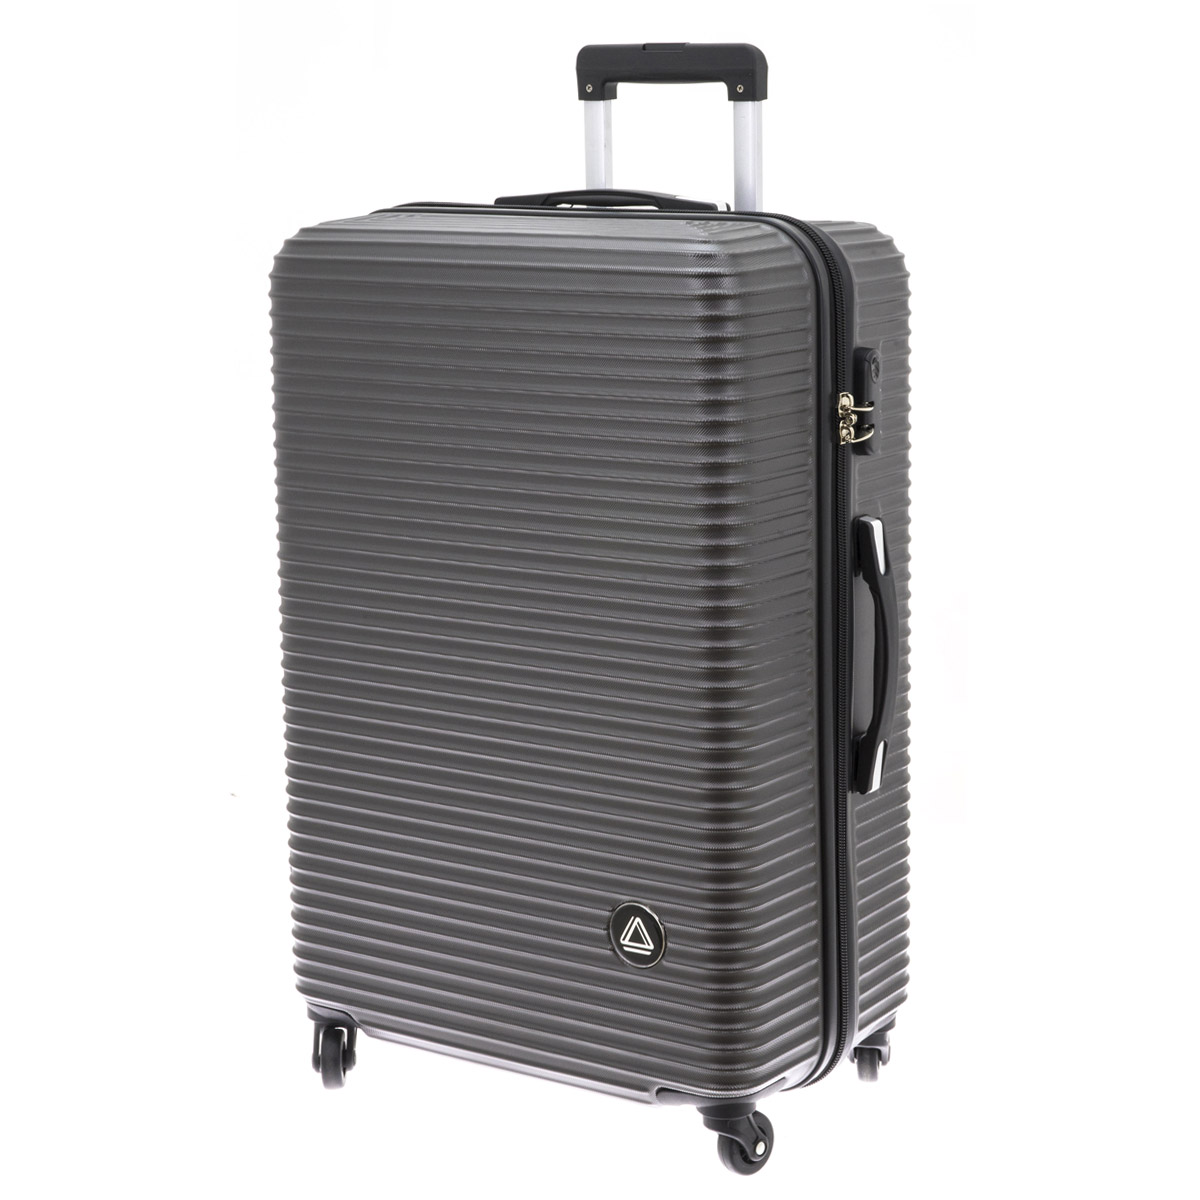 Valise trolley coque ABS \'Davidt\'s\' gris anthracite - 75x49x29 cm - [Q9934]